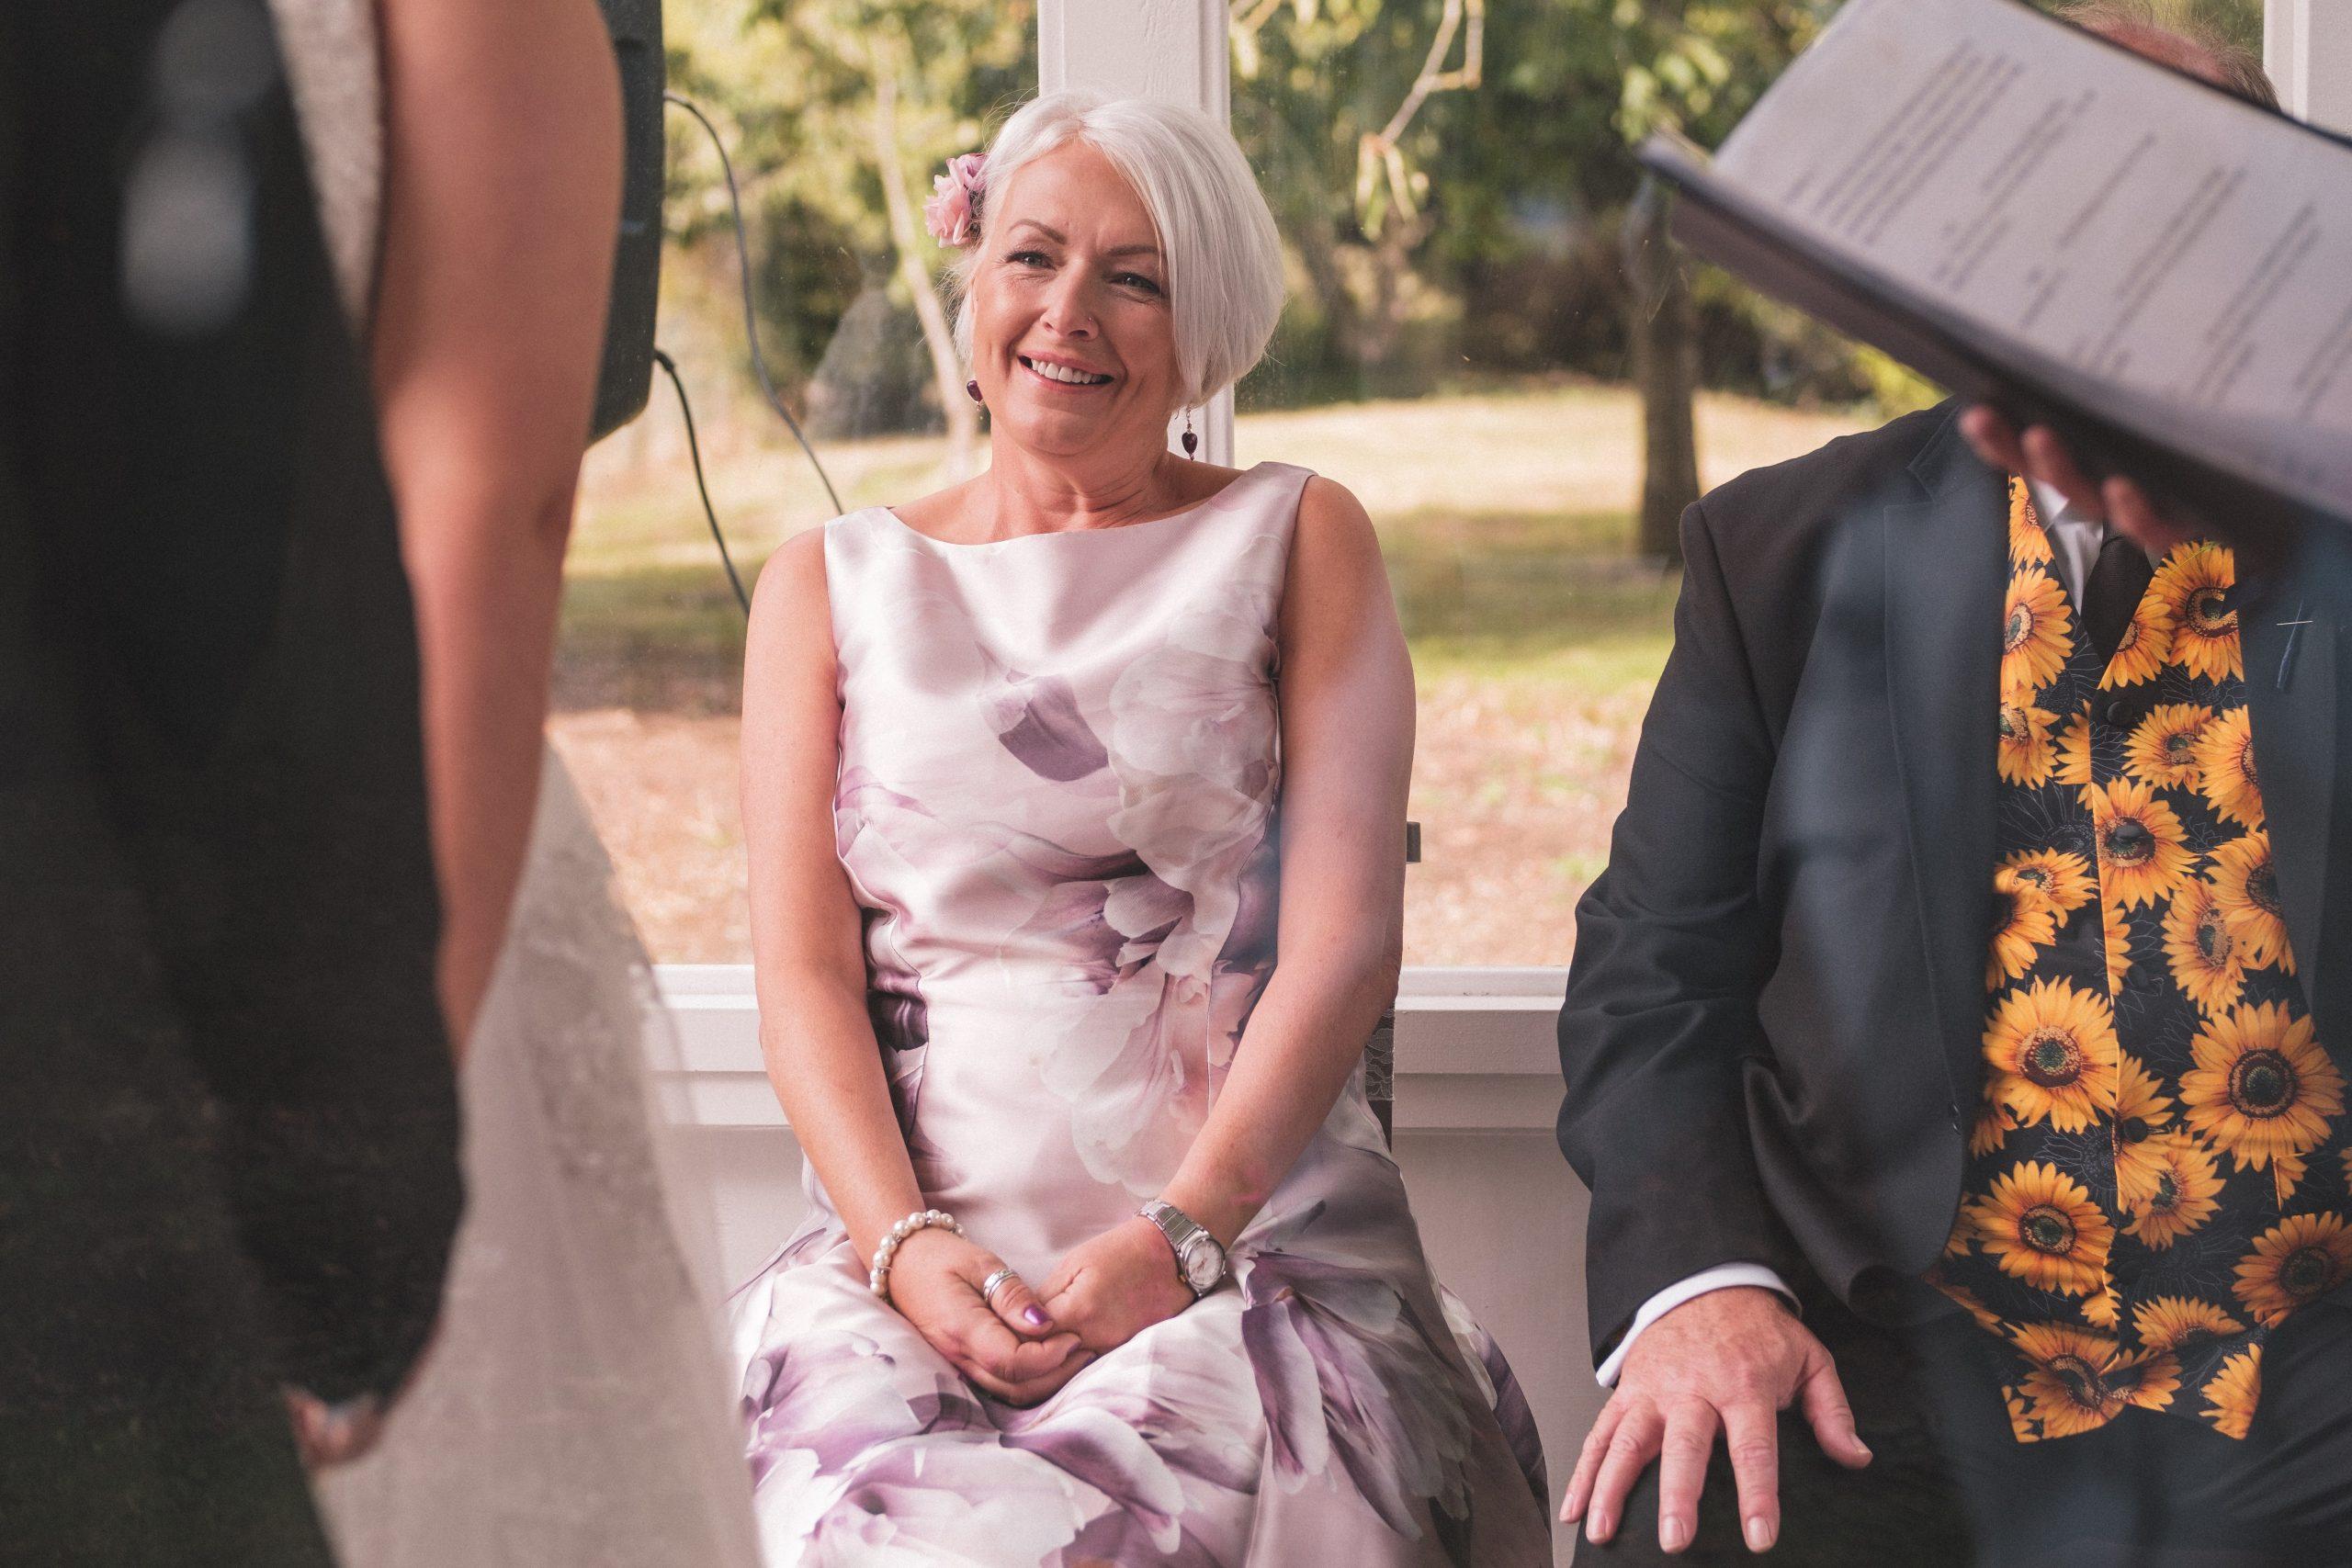 Proud Mum looks on at her daughter during Essex wedding